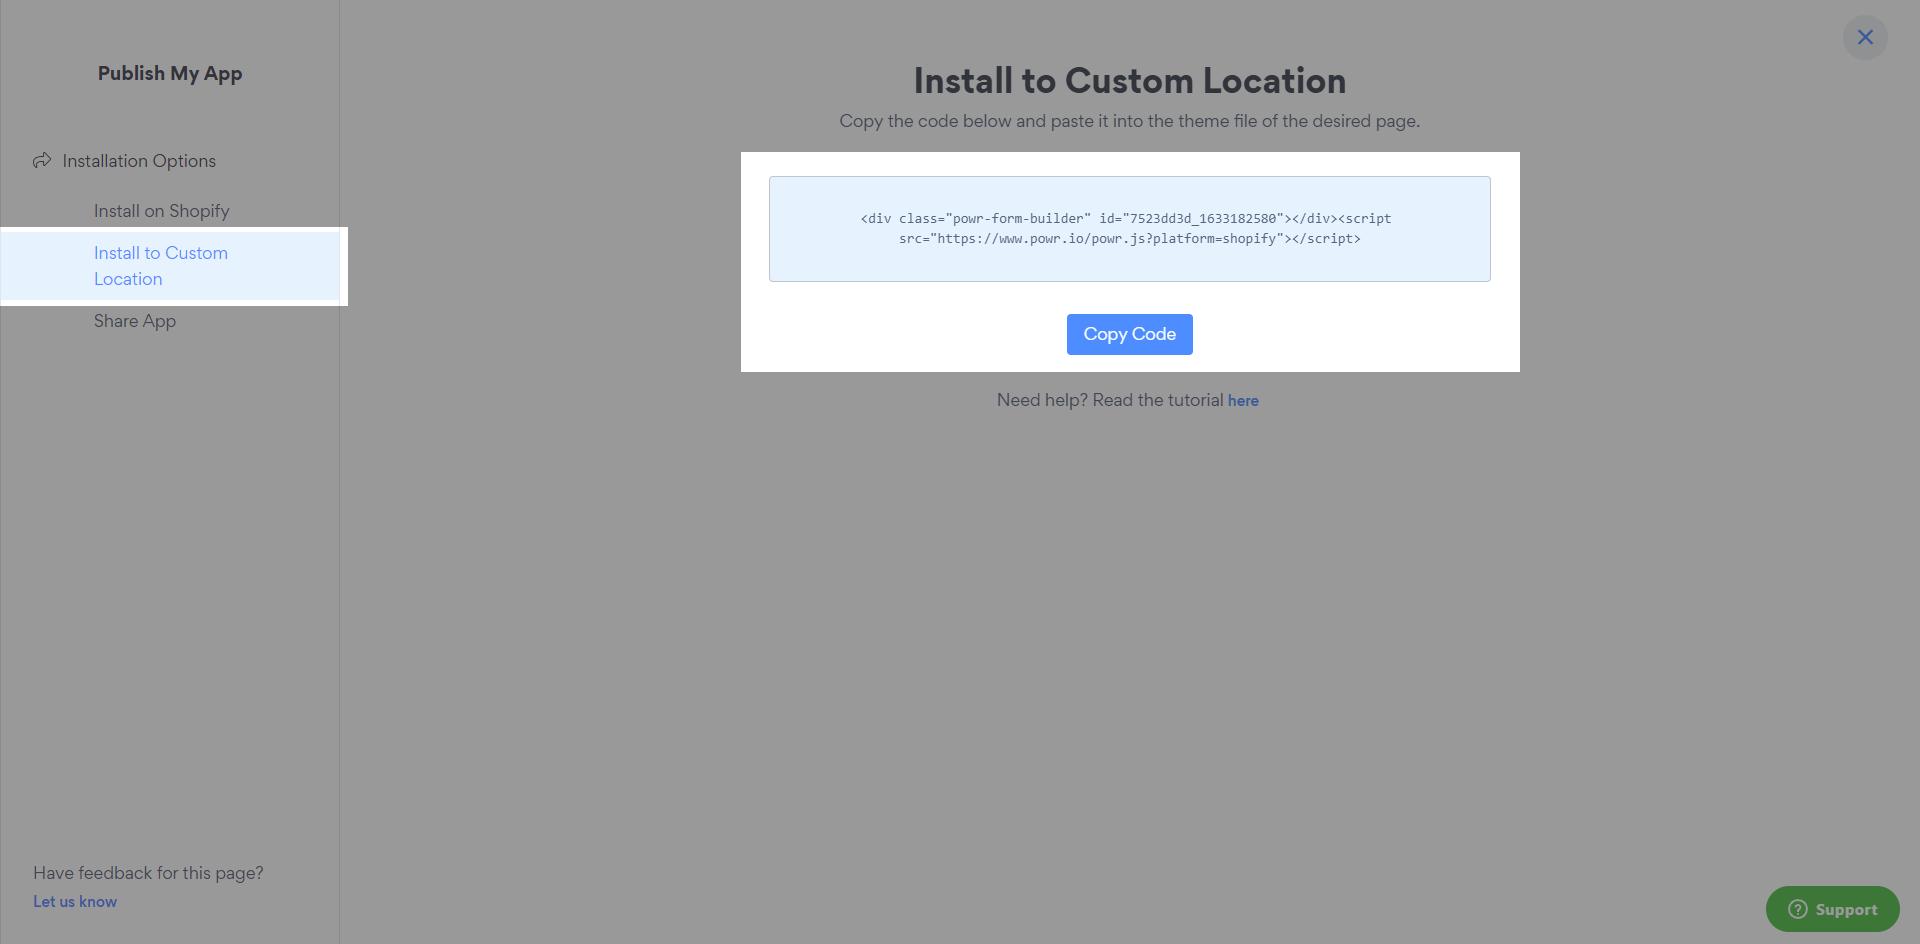 Configure POWR Form Builder App